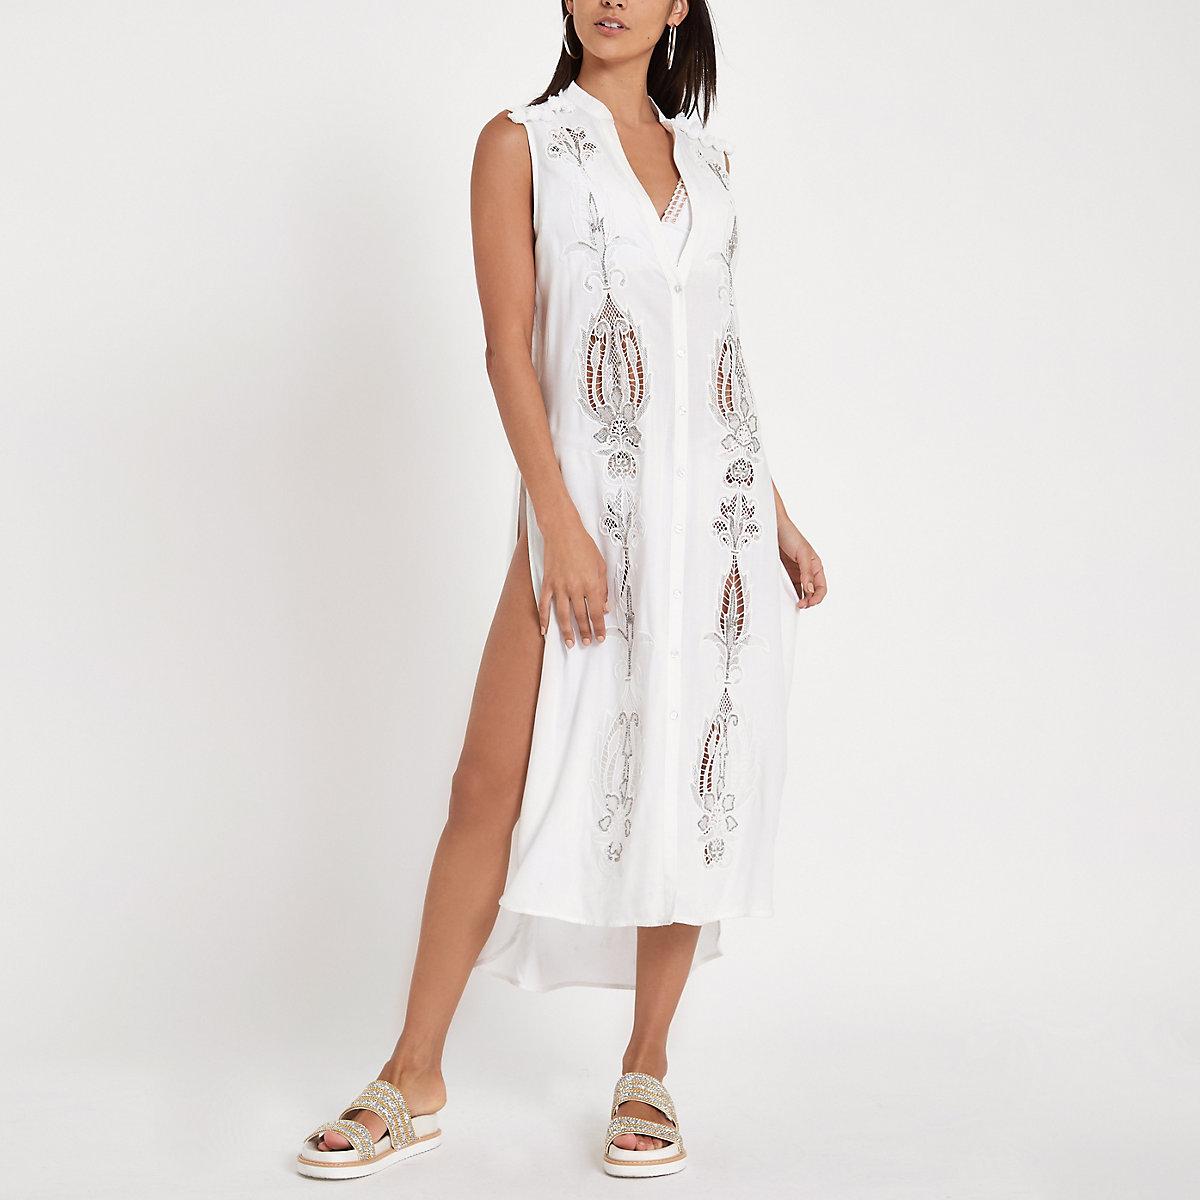 White embroidered maxi beach shirt dress